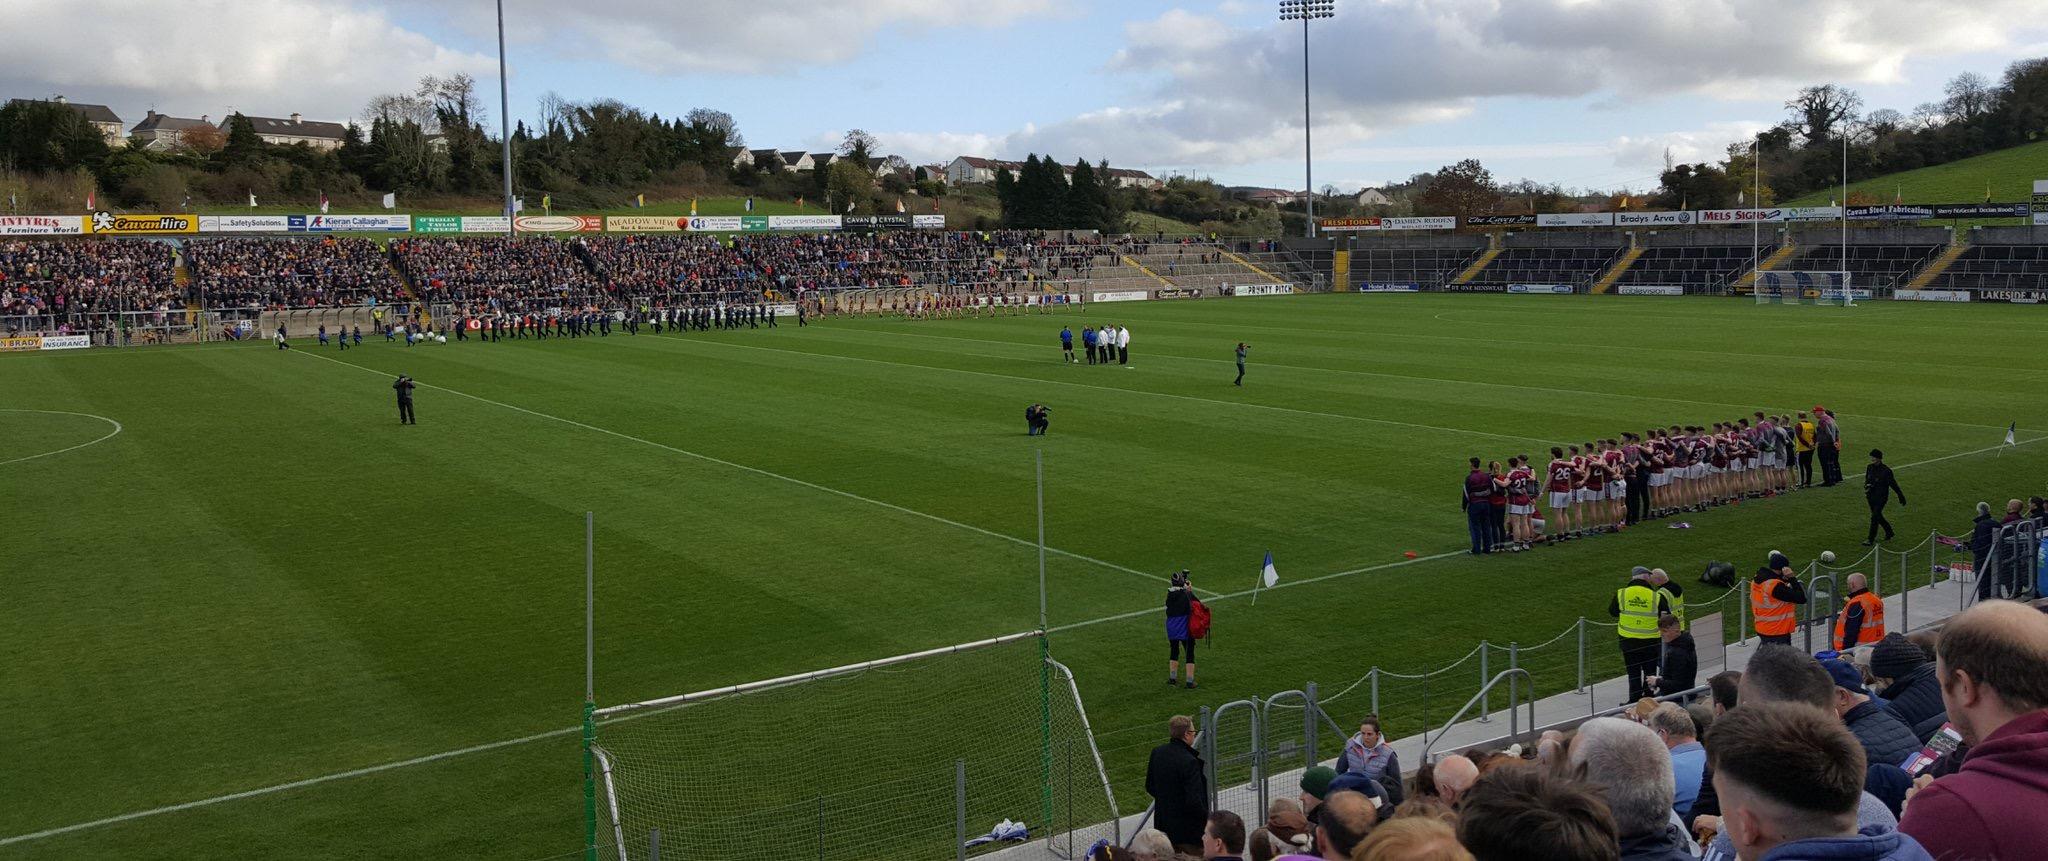 Match Report: Castlerahan make history in claiming Hotel Kilmore Senior Football Championship